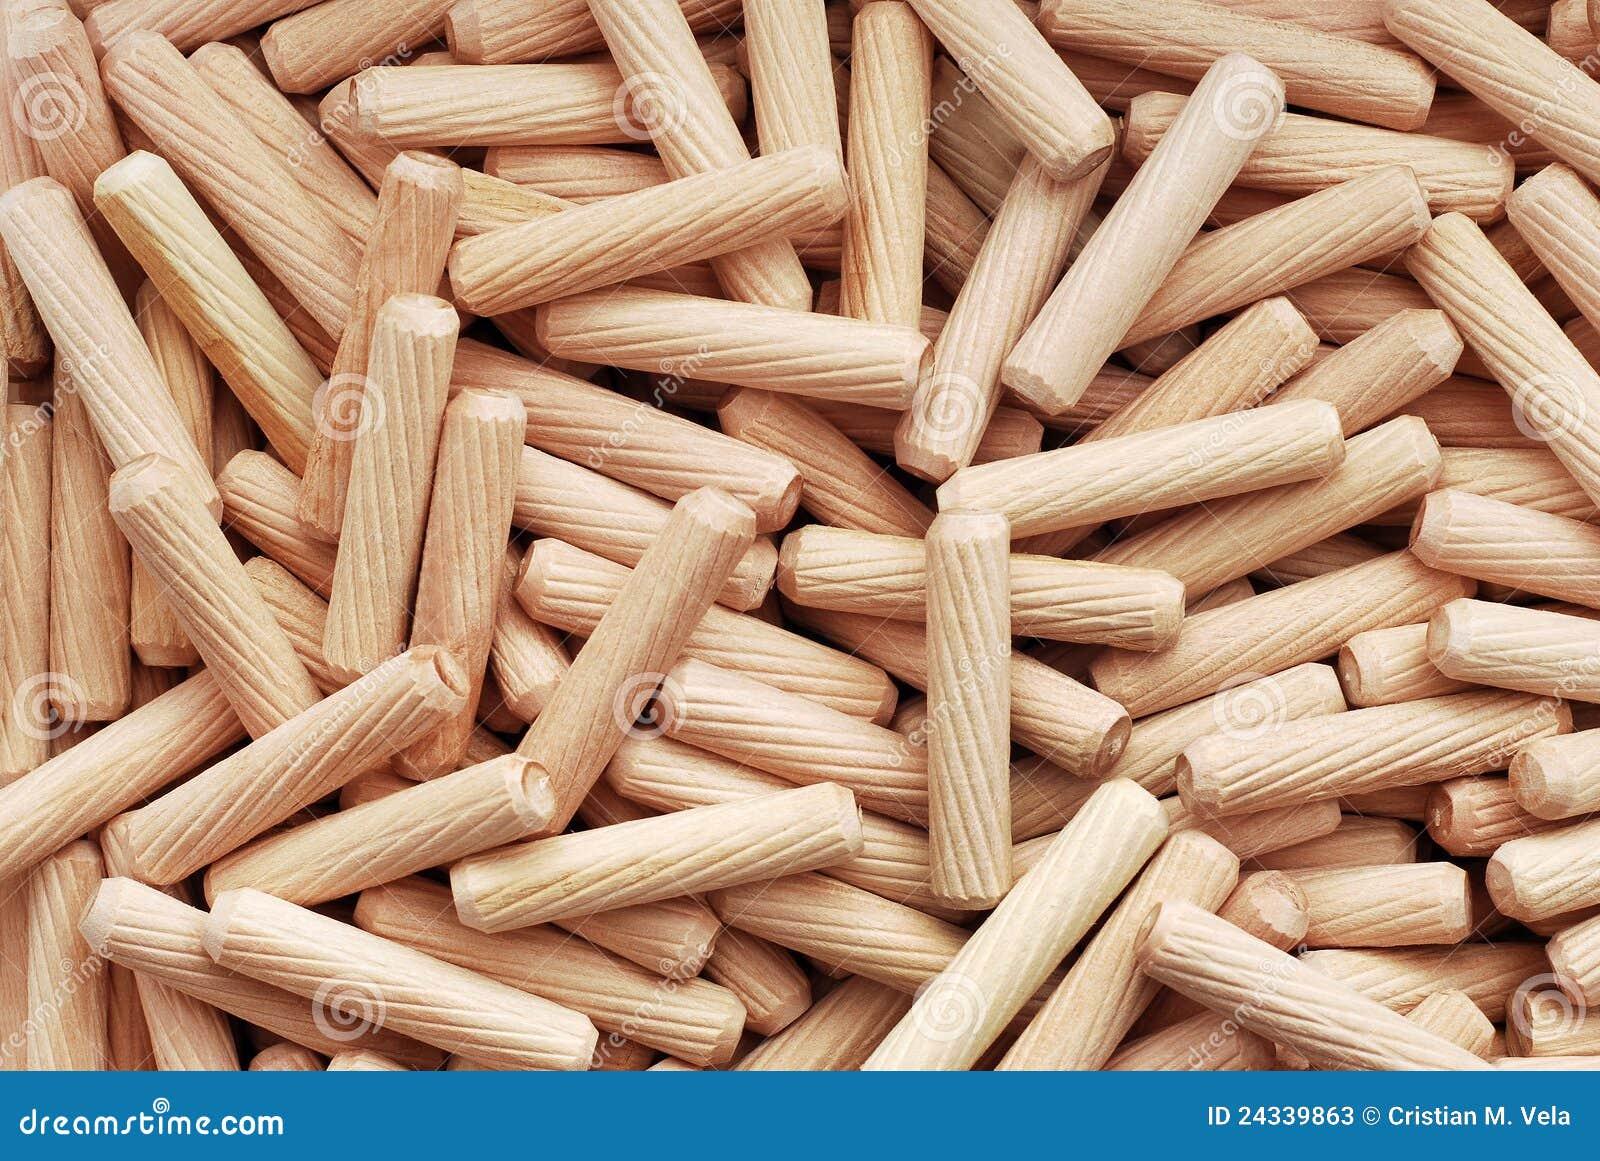 goujons en bois image stock image du texture branchez 24339863. Black Bedroom Furniture Sets. Home Design Ideas